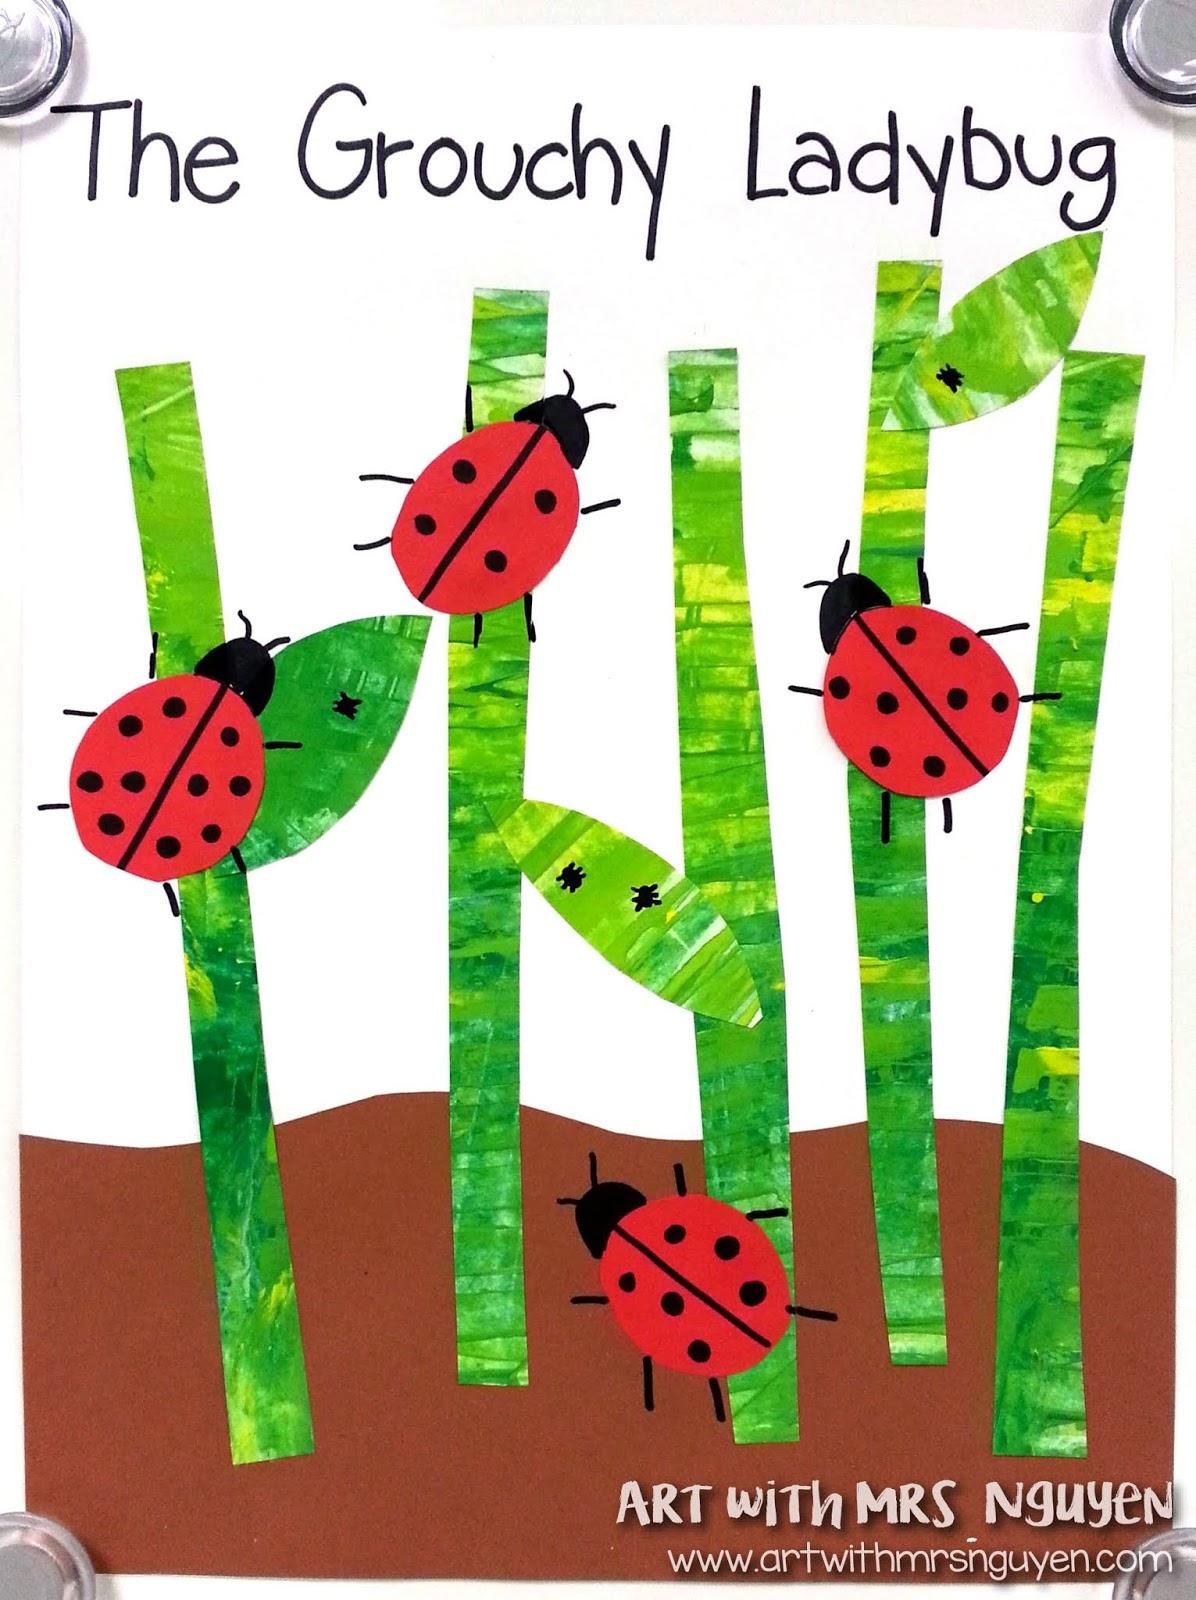 The Grouchy Ladybug Collage K